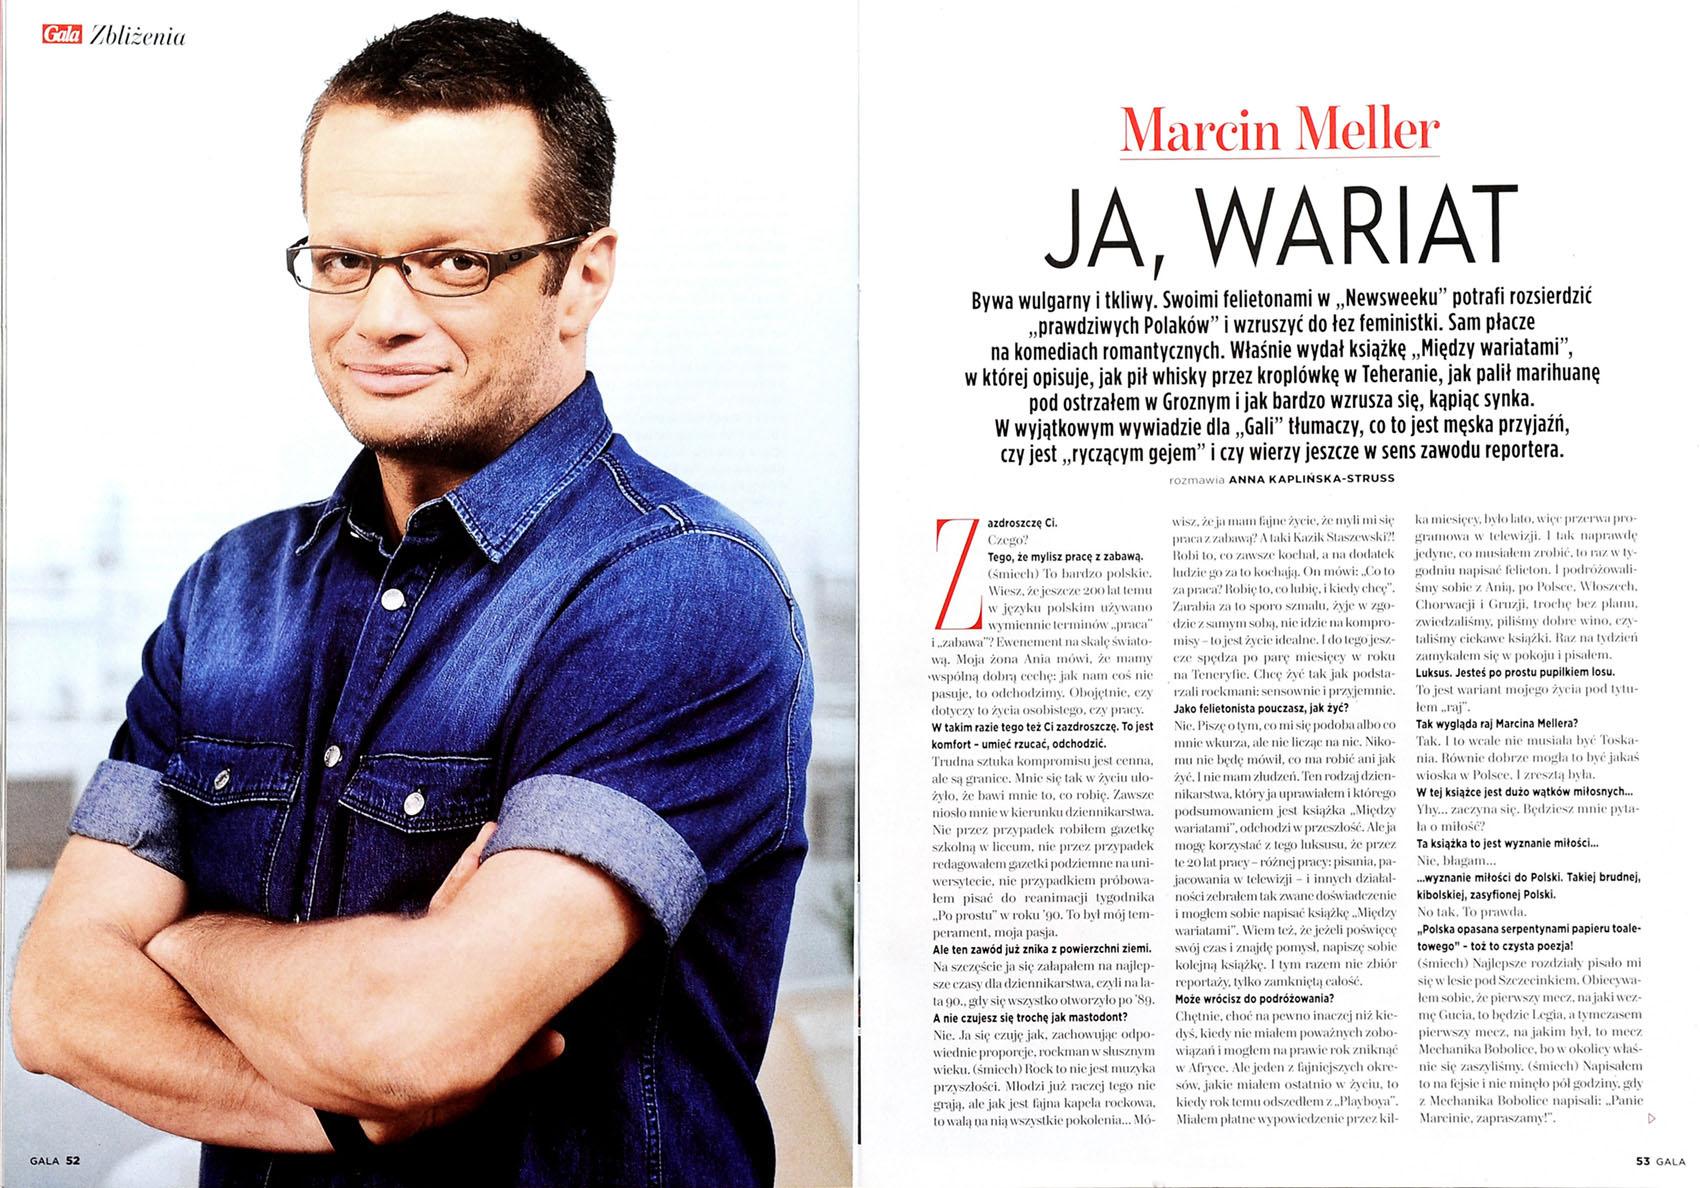 GALA nr 23/2013 r., s. 52 - Marcin Meller